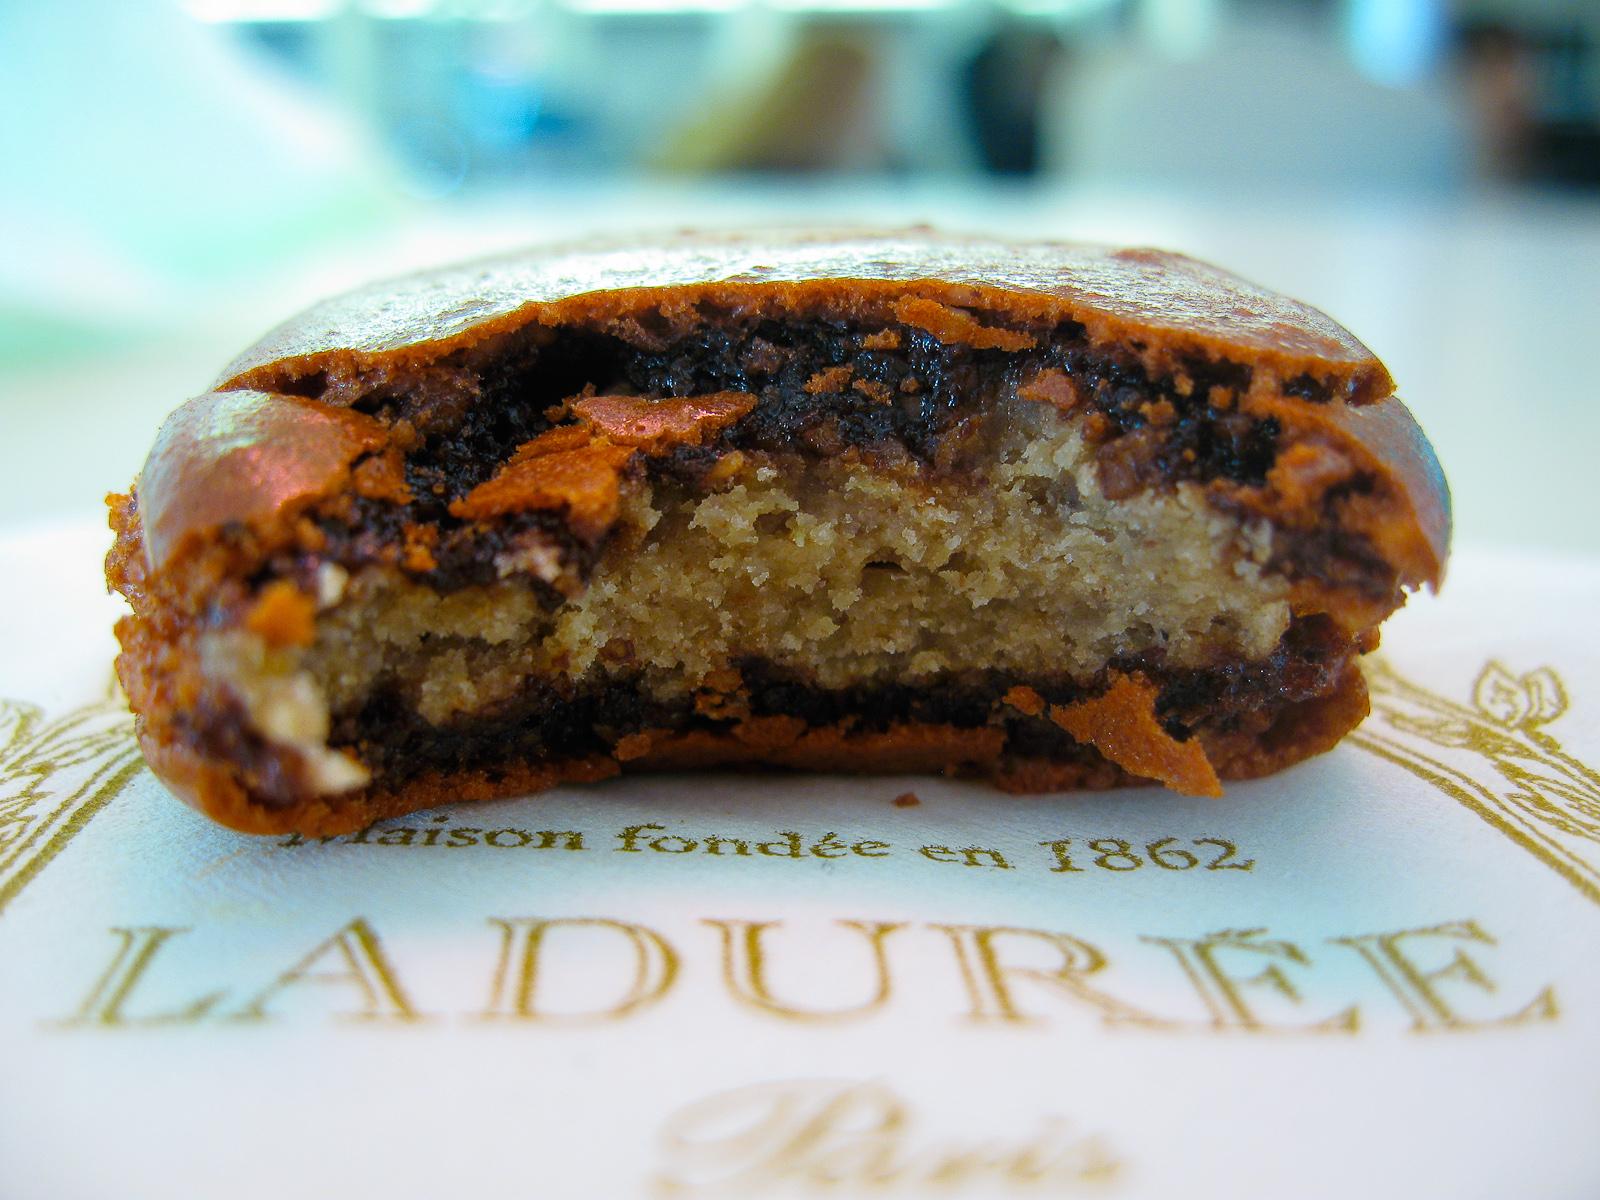 Laduree pain d'épice (gingerbread) macaron